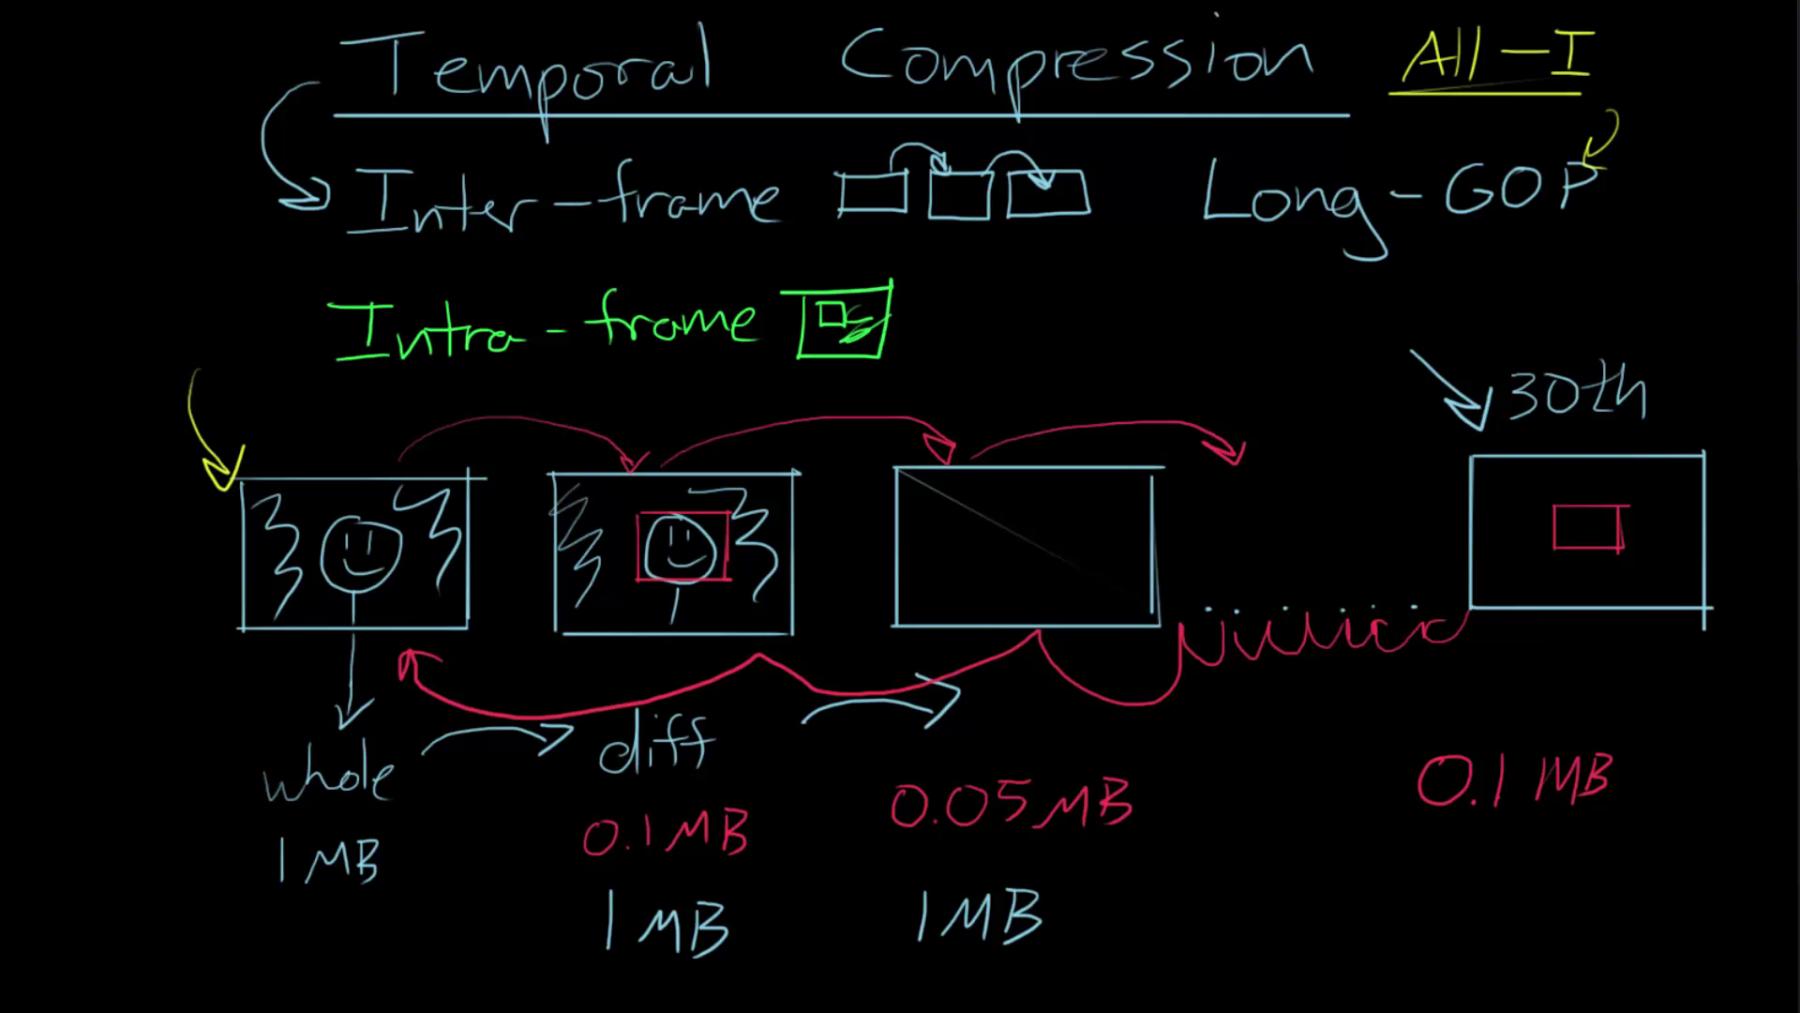 Resultado de imagen para long-GOP 8 bits vs 1 bits